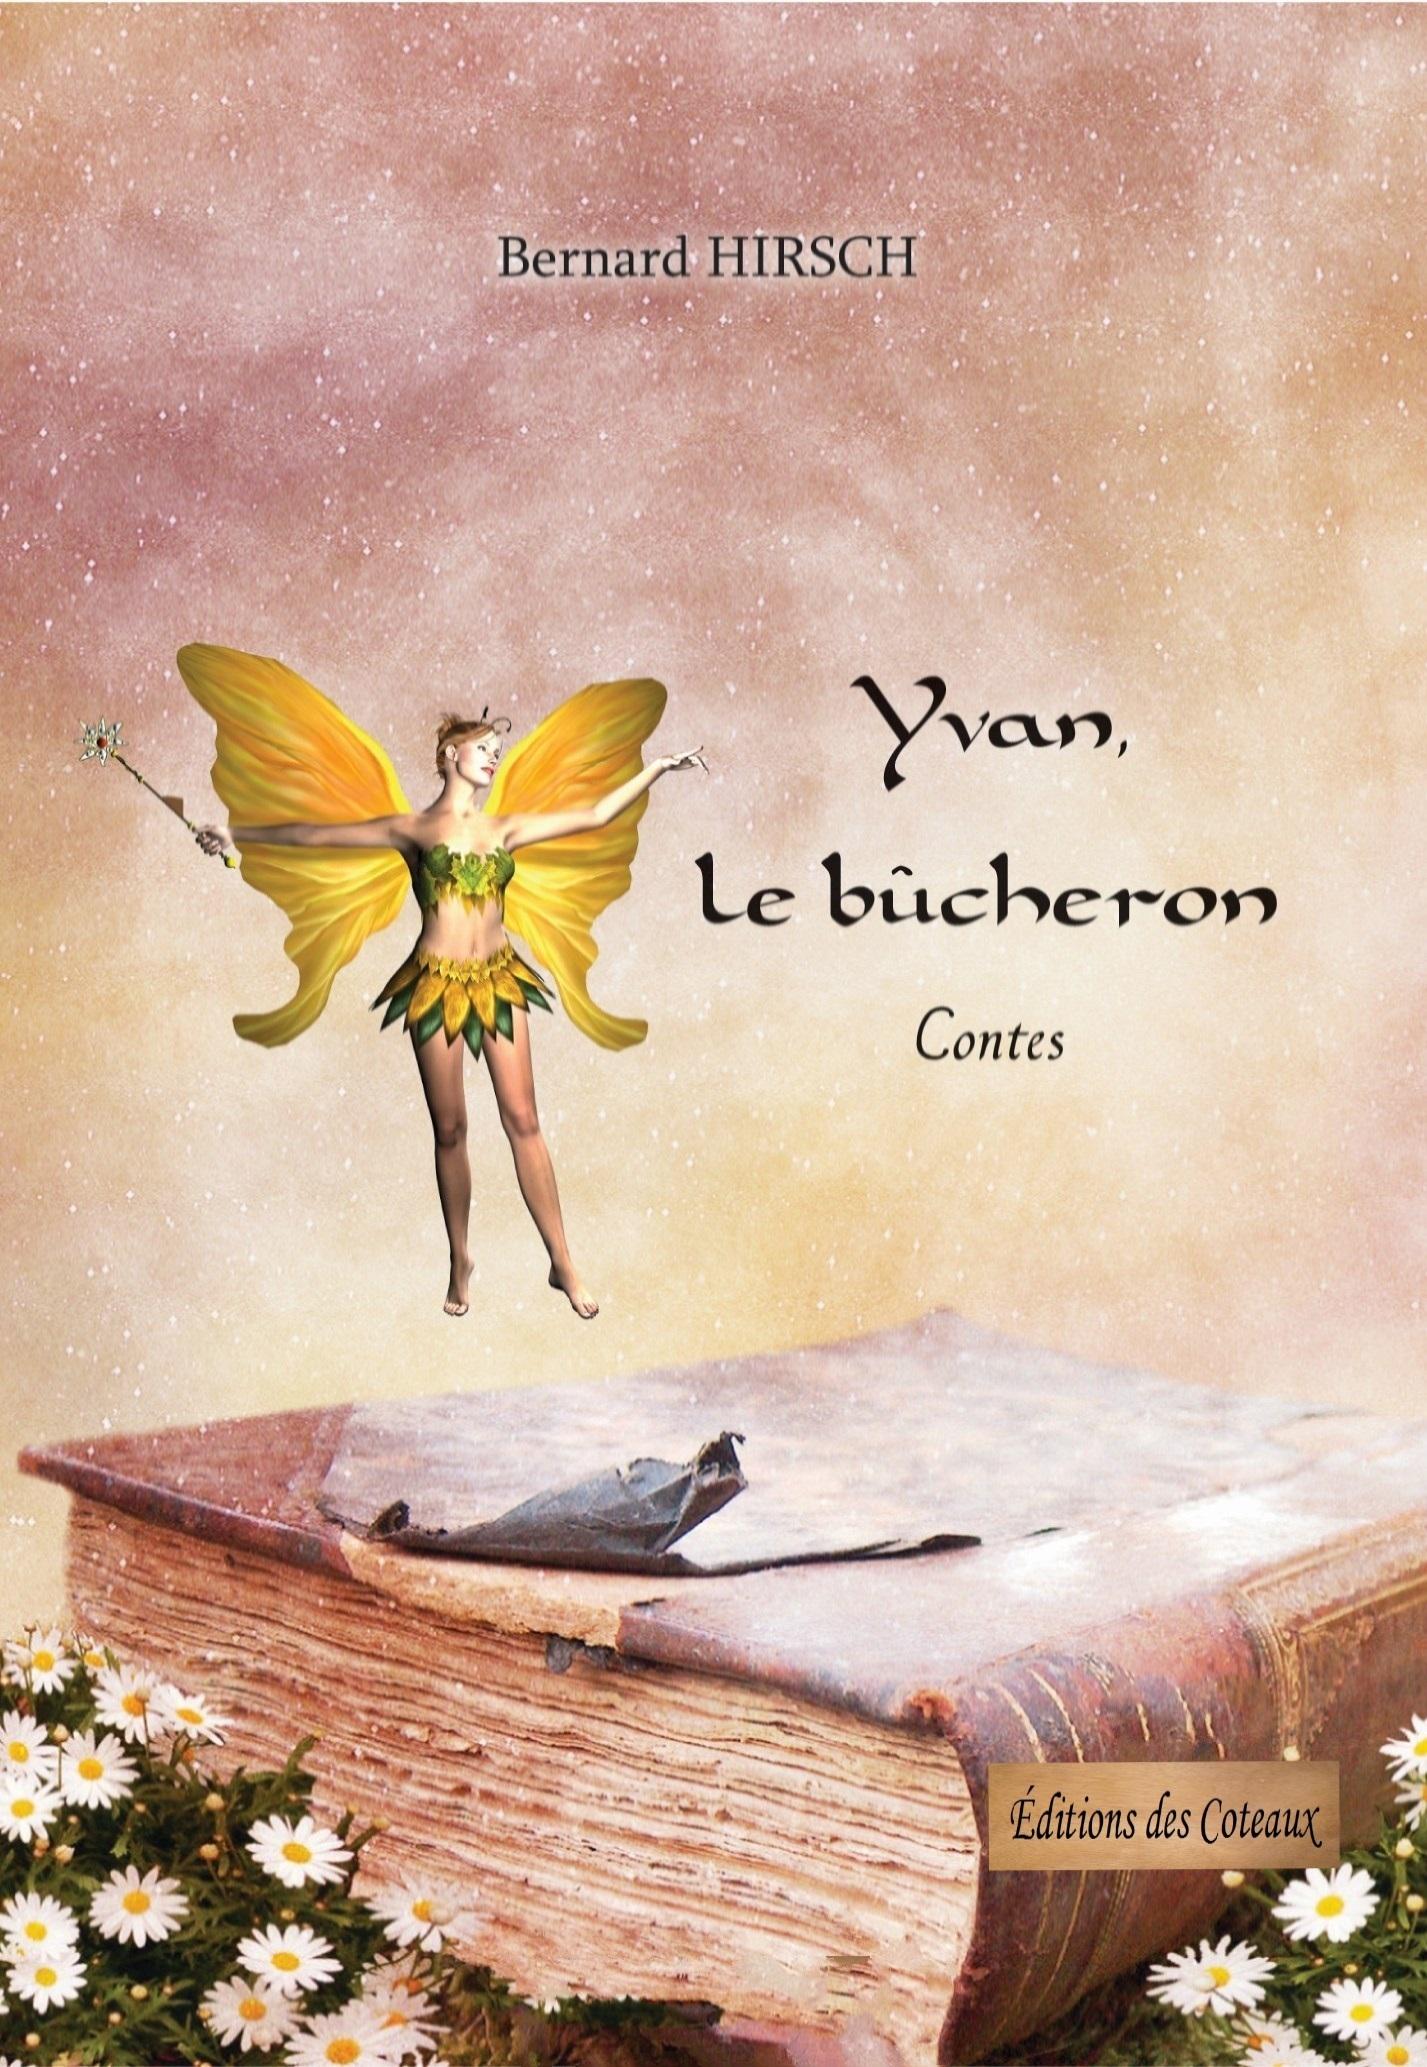 YVAN LE BUCHERON